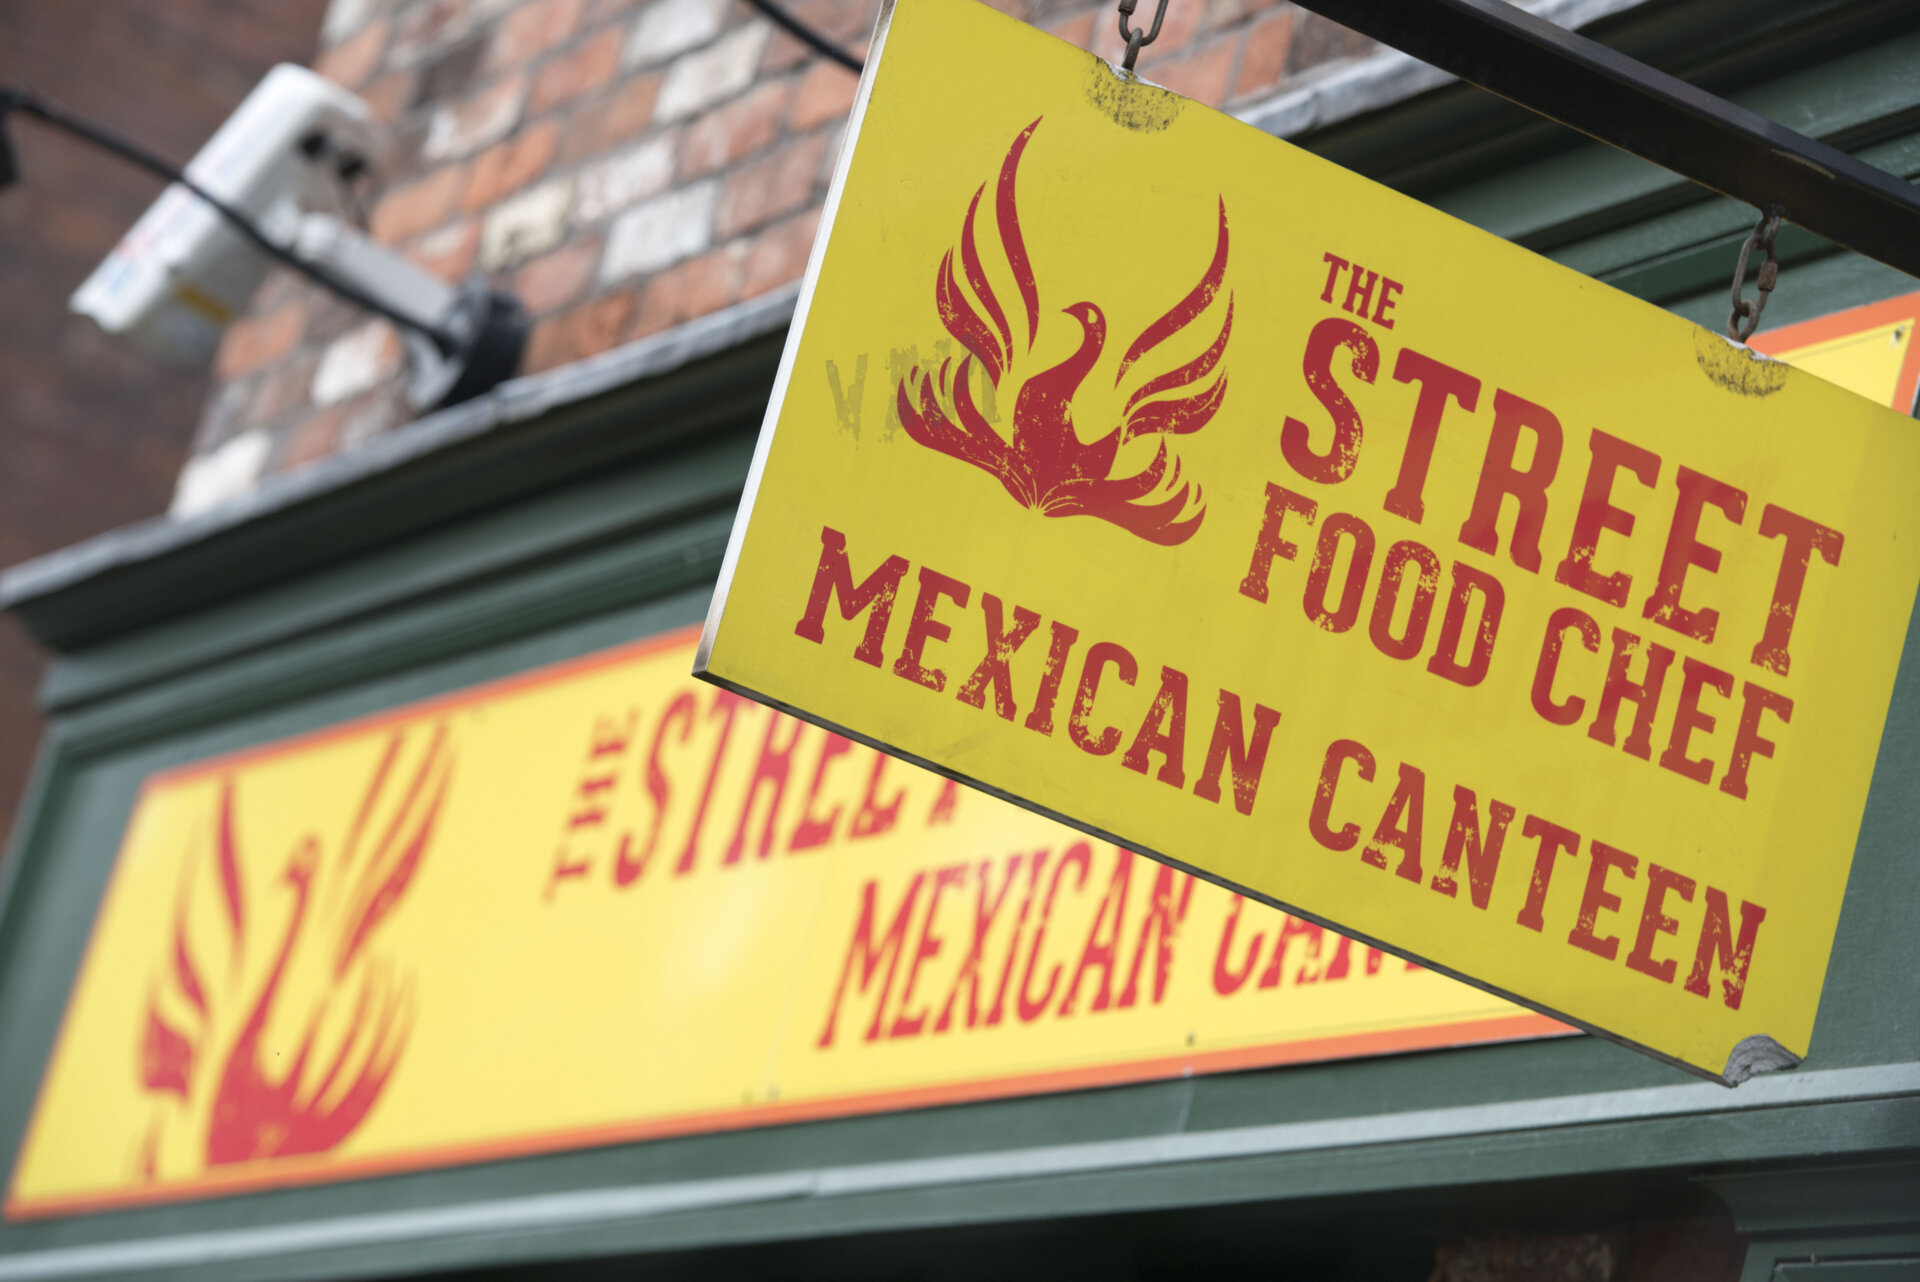 DA STREET FOOD CHEF 26